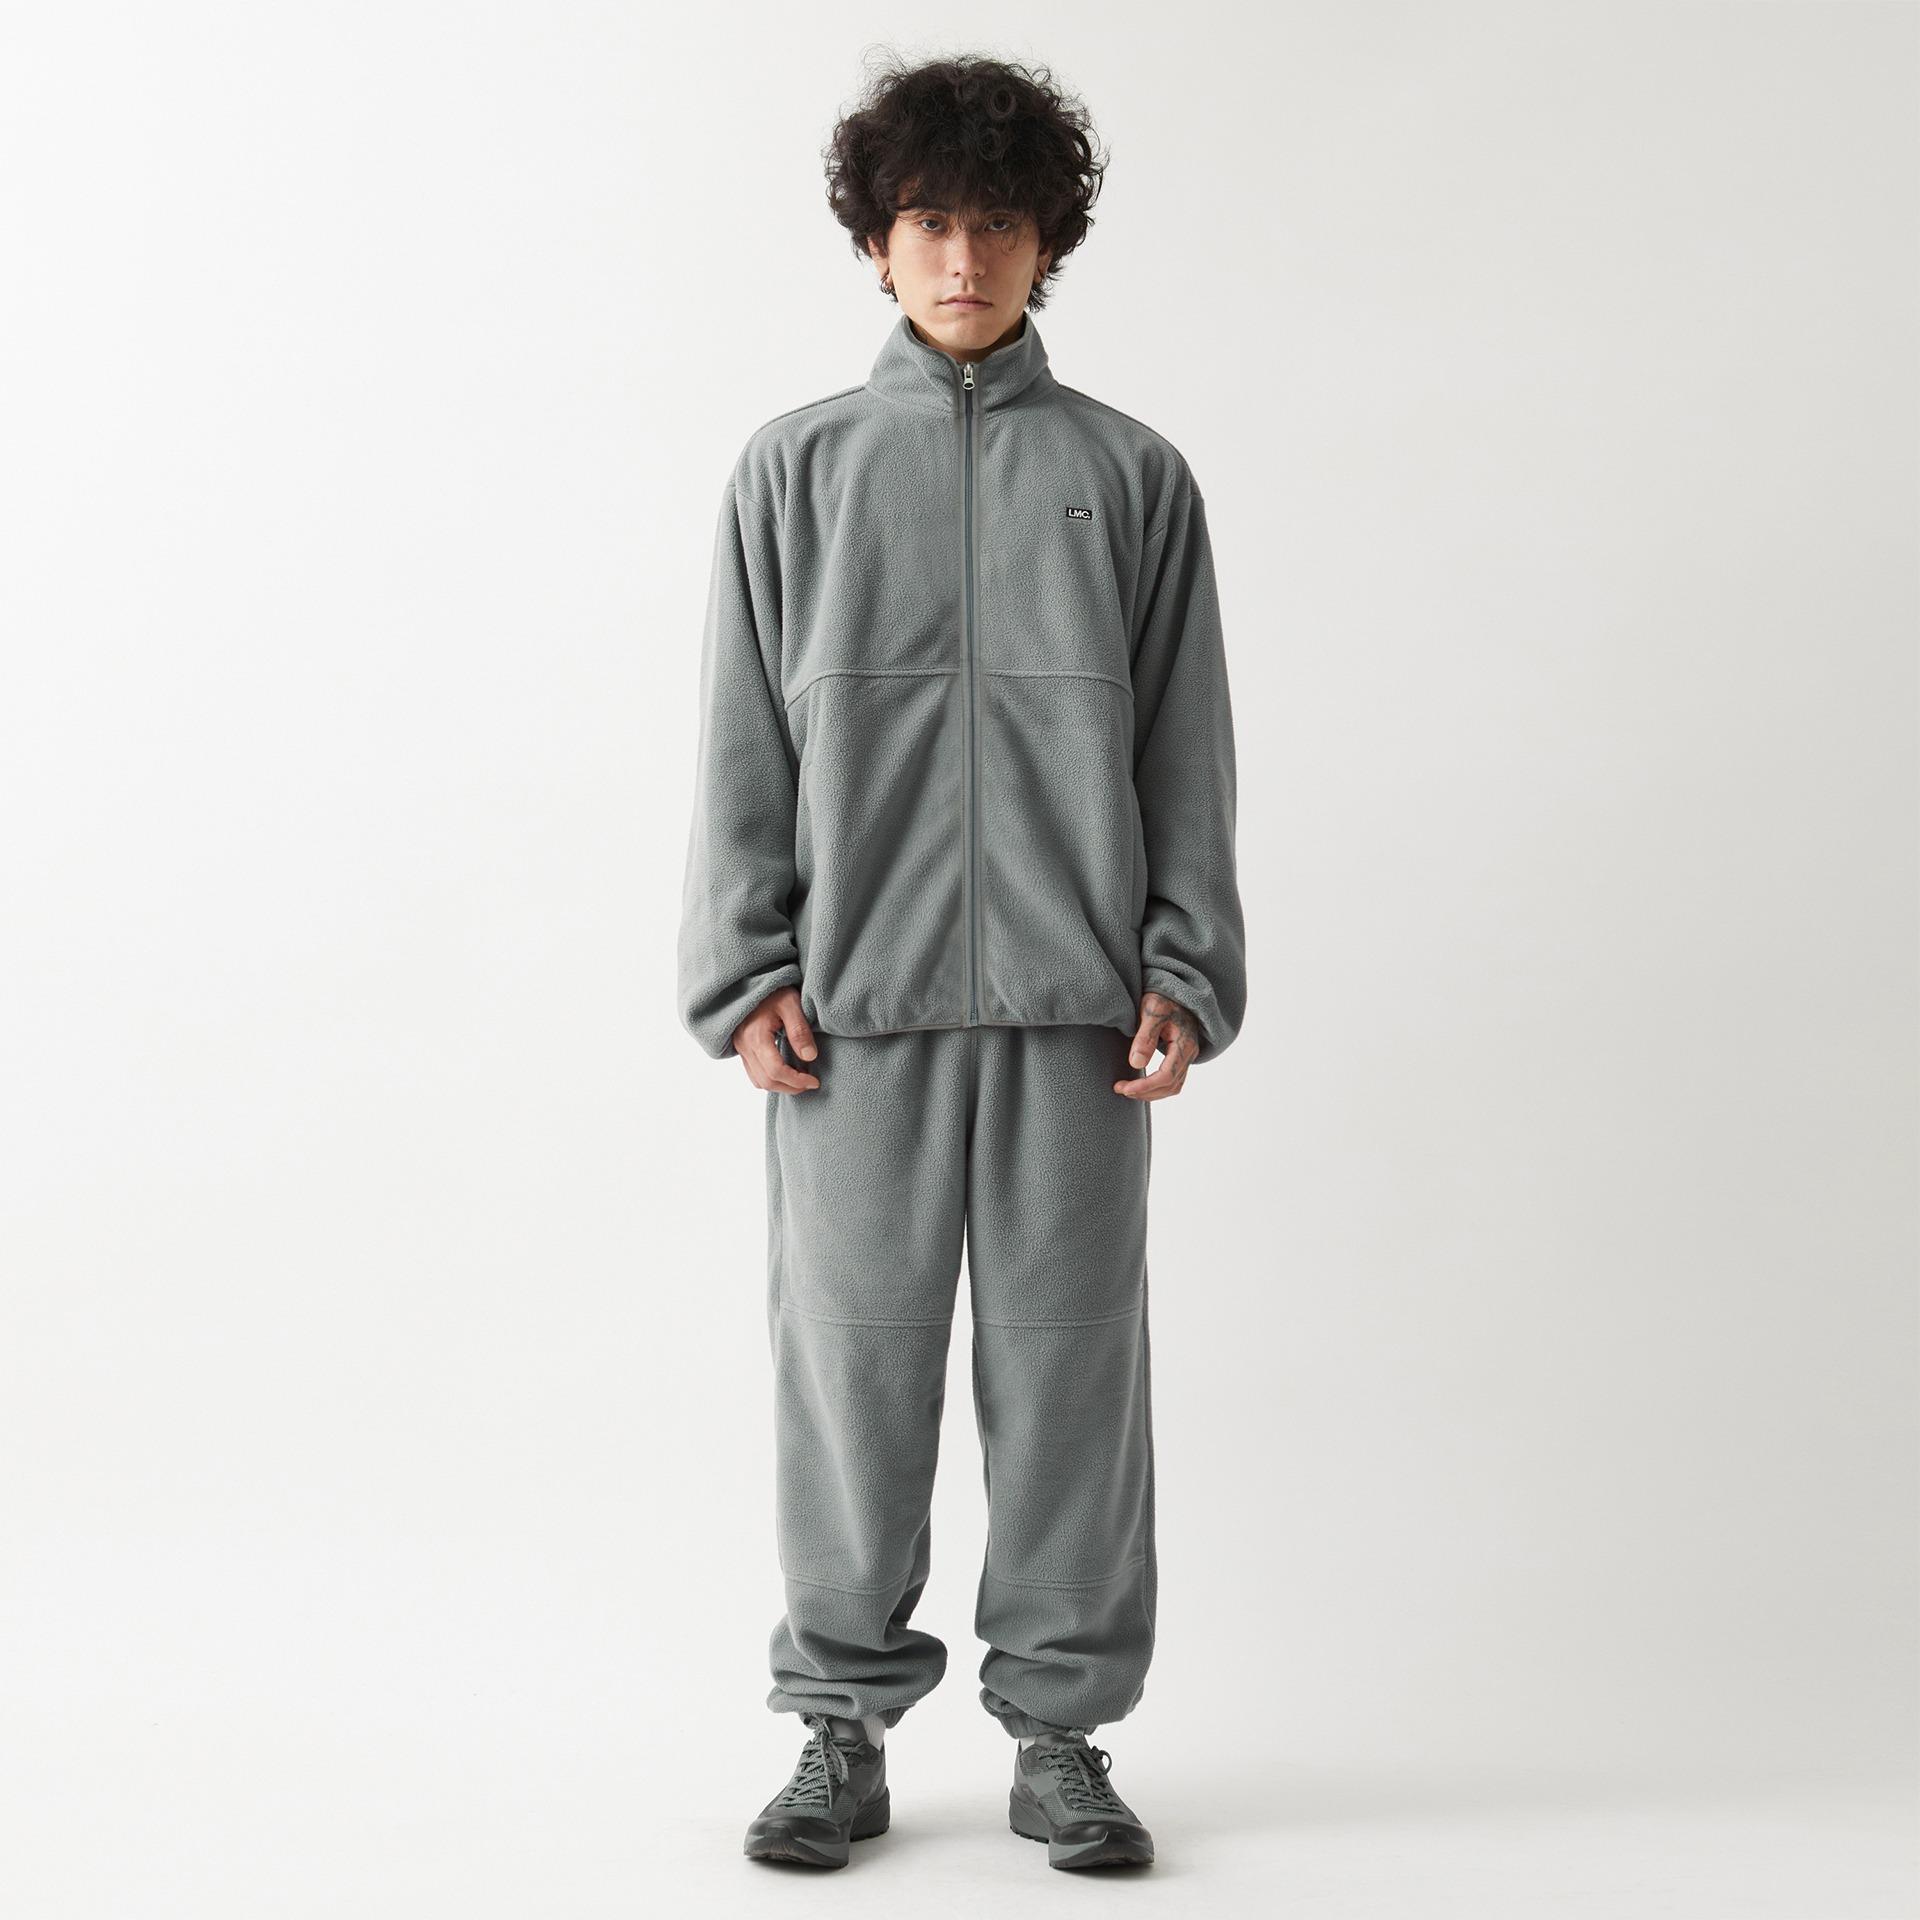 layer-LMC FLEECE TEAM JACKET gray♡韓國男裝外套